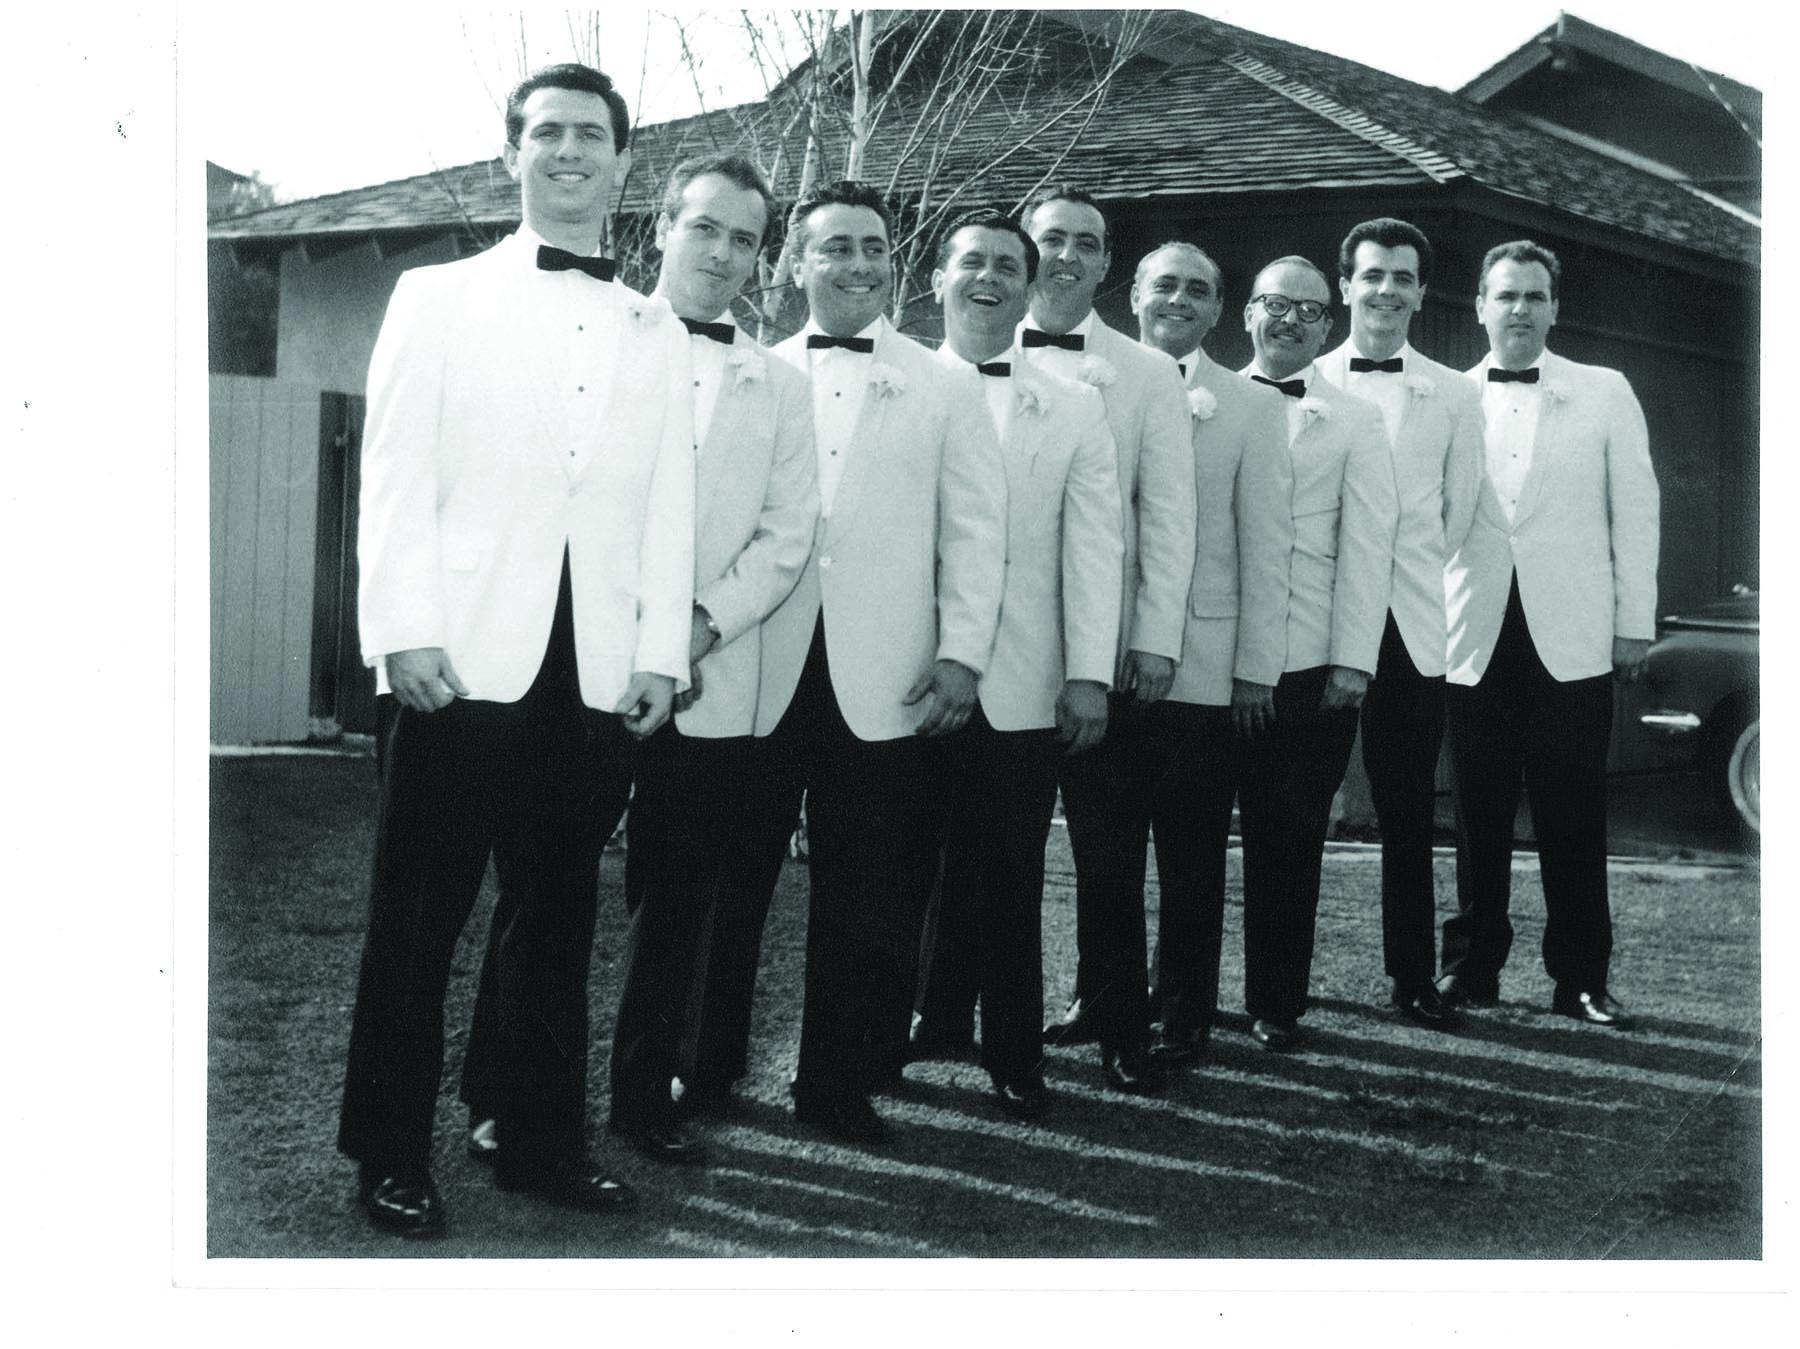 The Venti brothers at John's wedding in 1964, from left: John, Sammy, Joe, Eddie, Willy, Luigi, Victor, Frankie and Tony